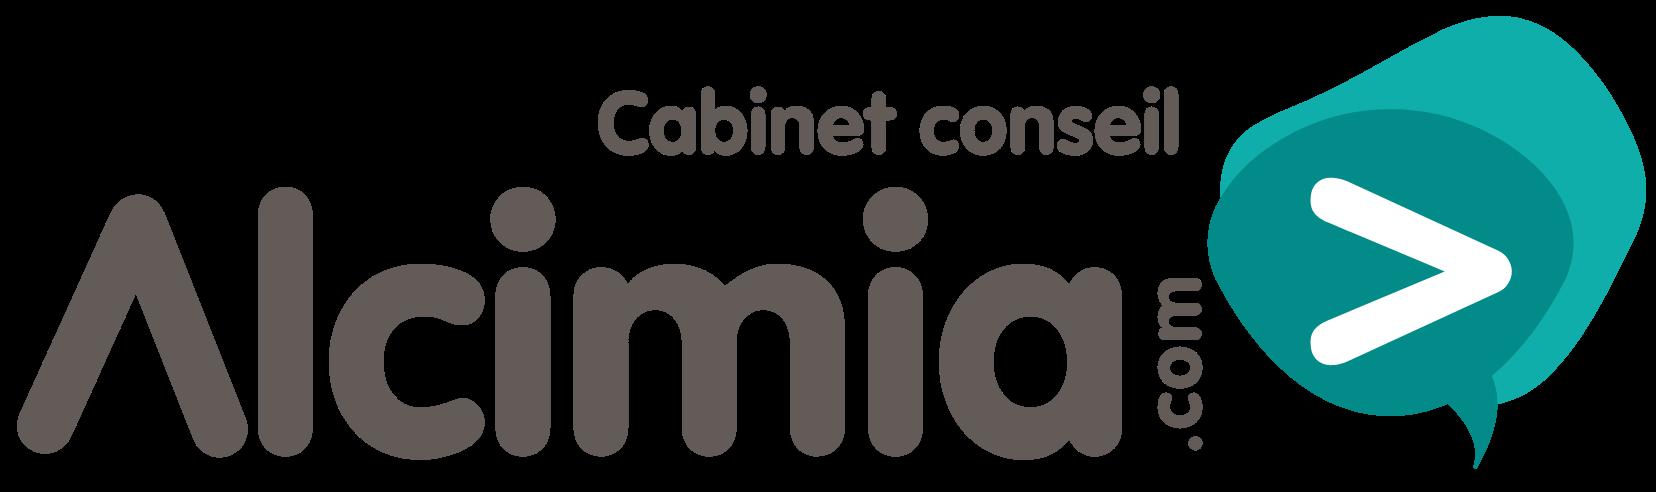 Alcimia, cabinet conseil digital marketing RH (Chambéry, Annecy, Grenoble, Lyon)